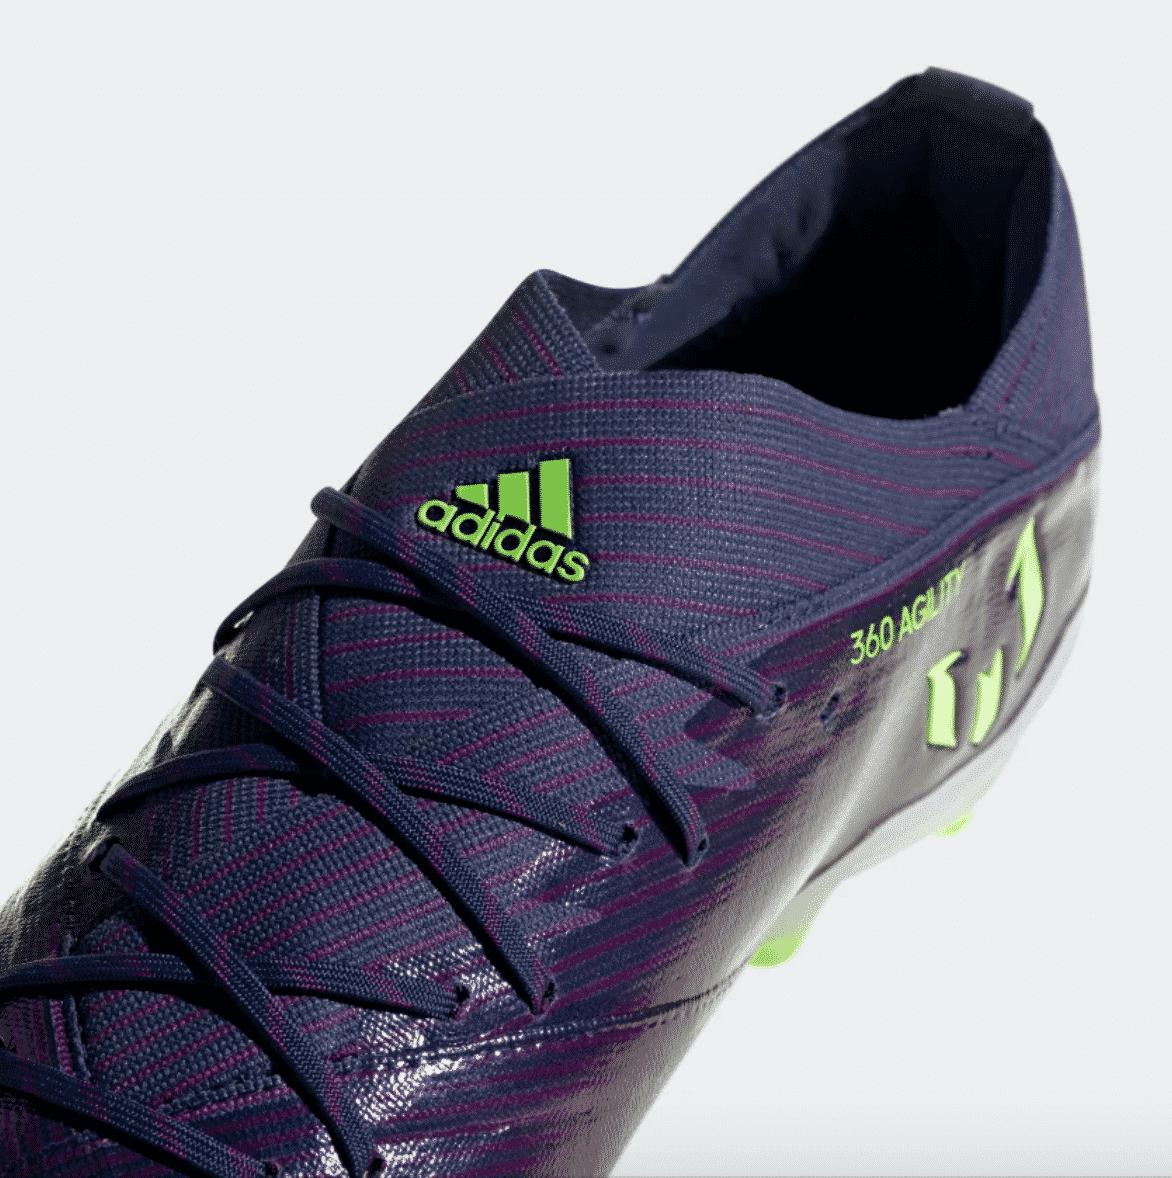 chaussures-adidas-nemeziz-19.1-lionel-messi-ballon-or-2019-9